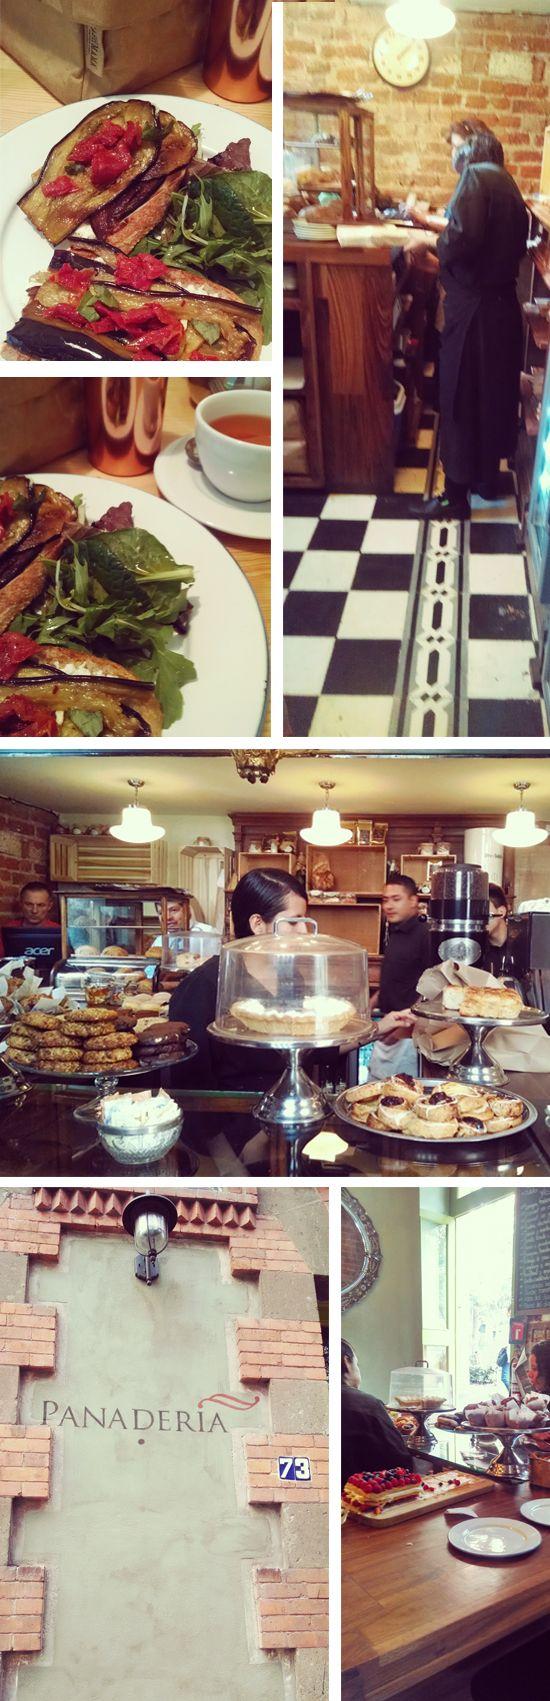 travel mexico city colonia juarez regeneration bars restaurants